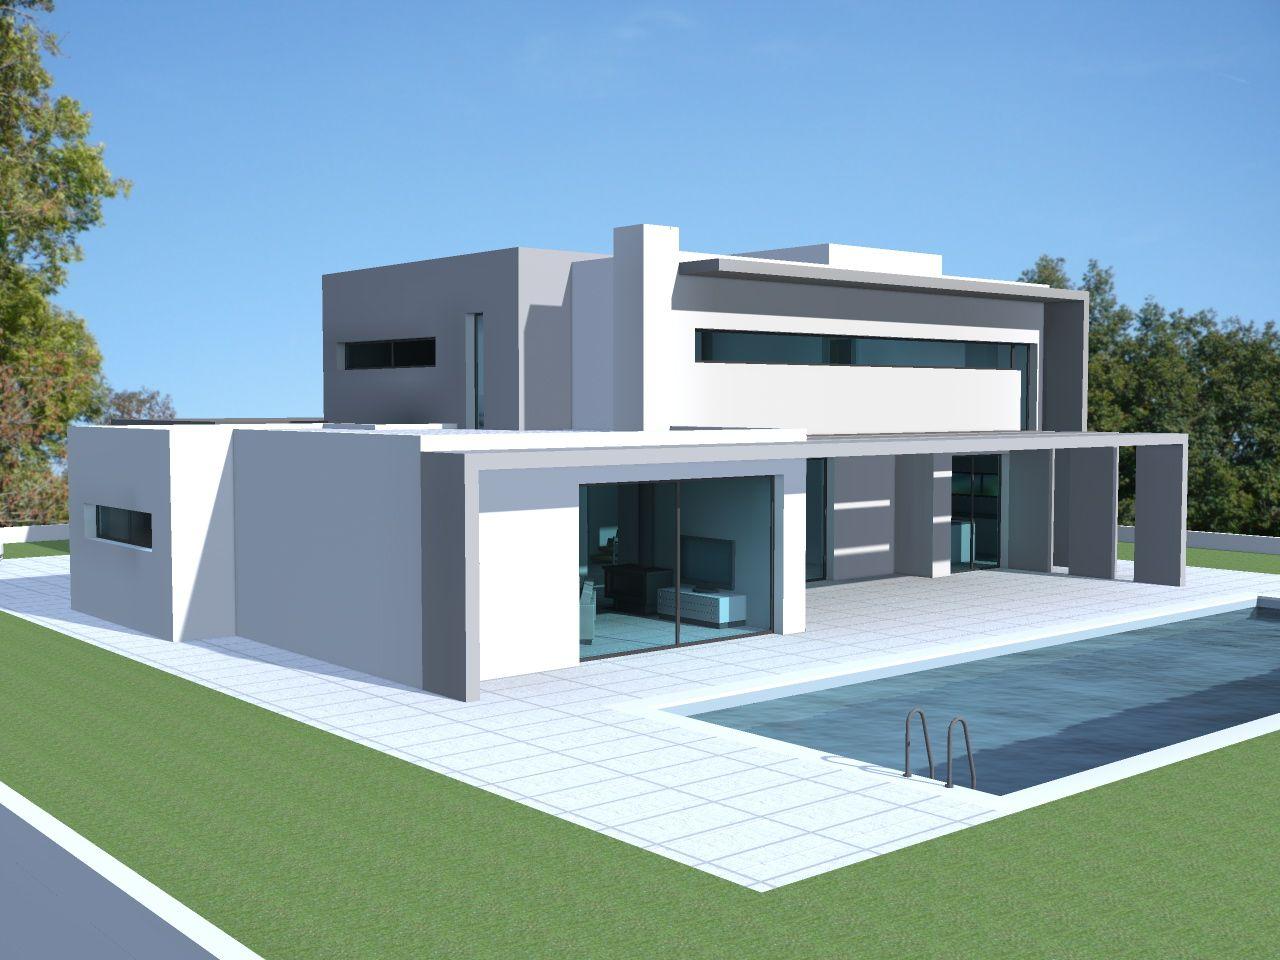 Turbo Image associée | Houses Exteriors | Pinterest | Toit plat, Maisons  PQ38